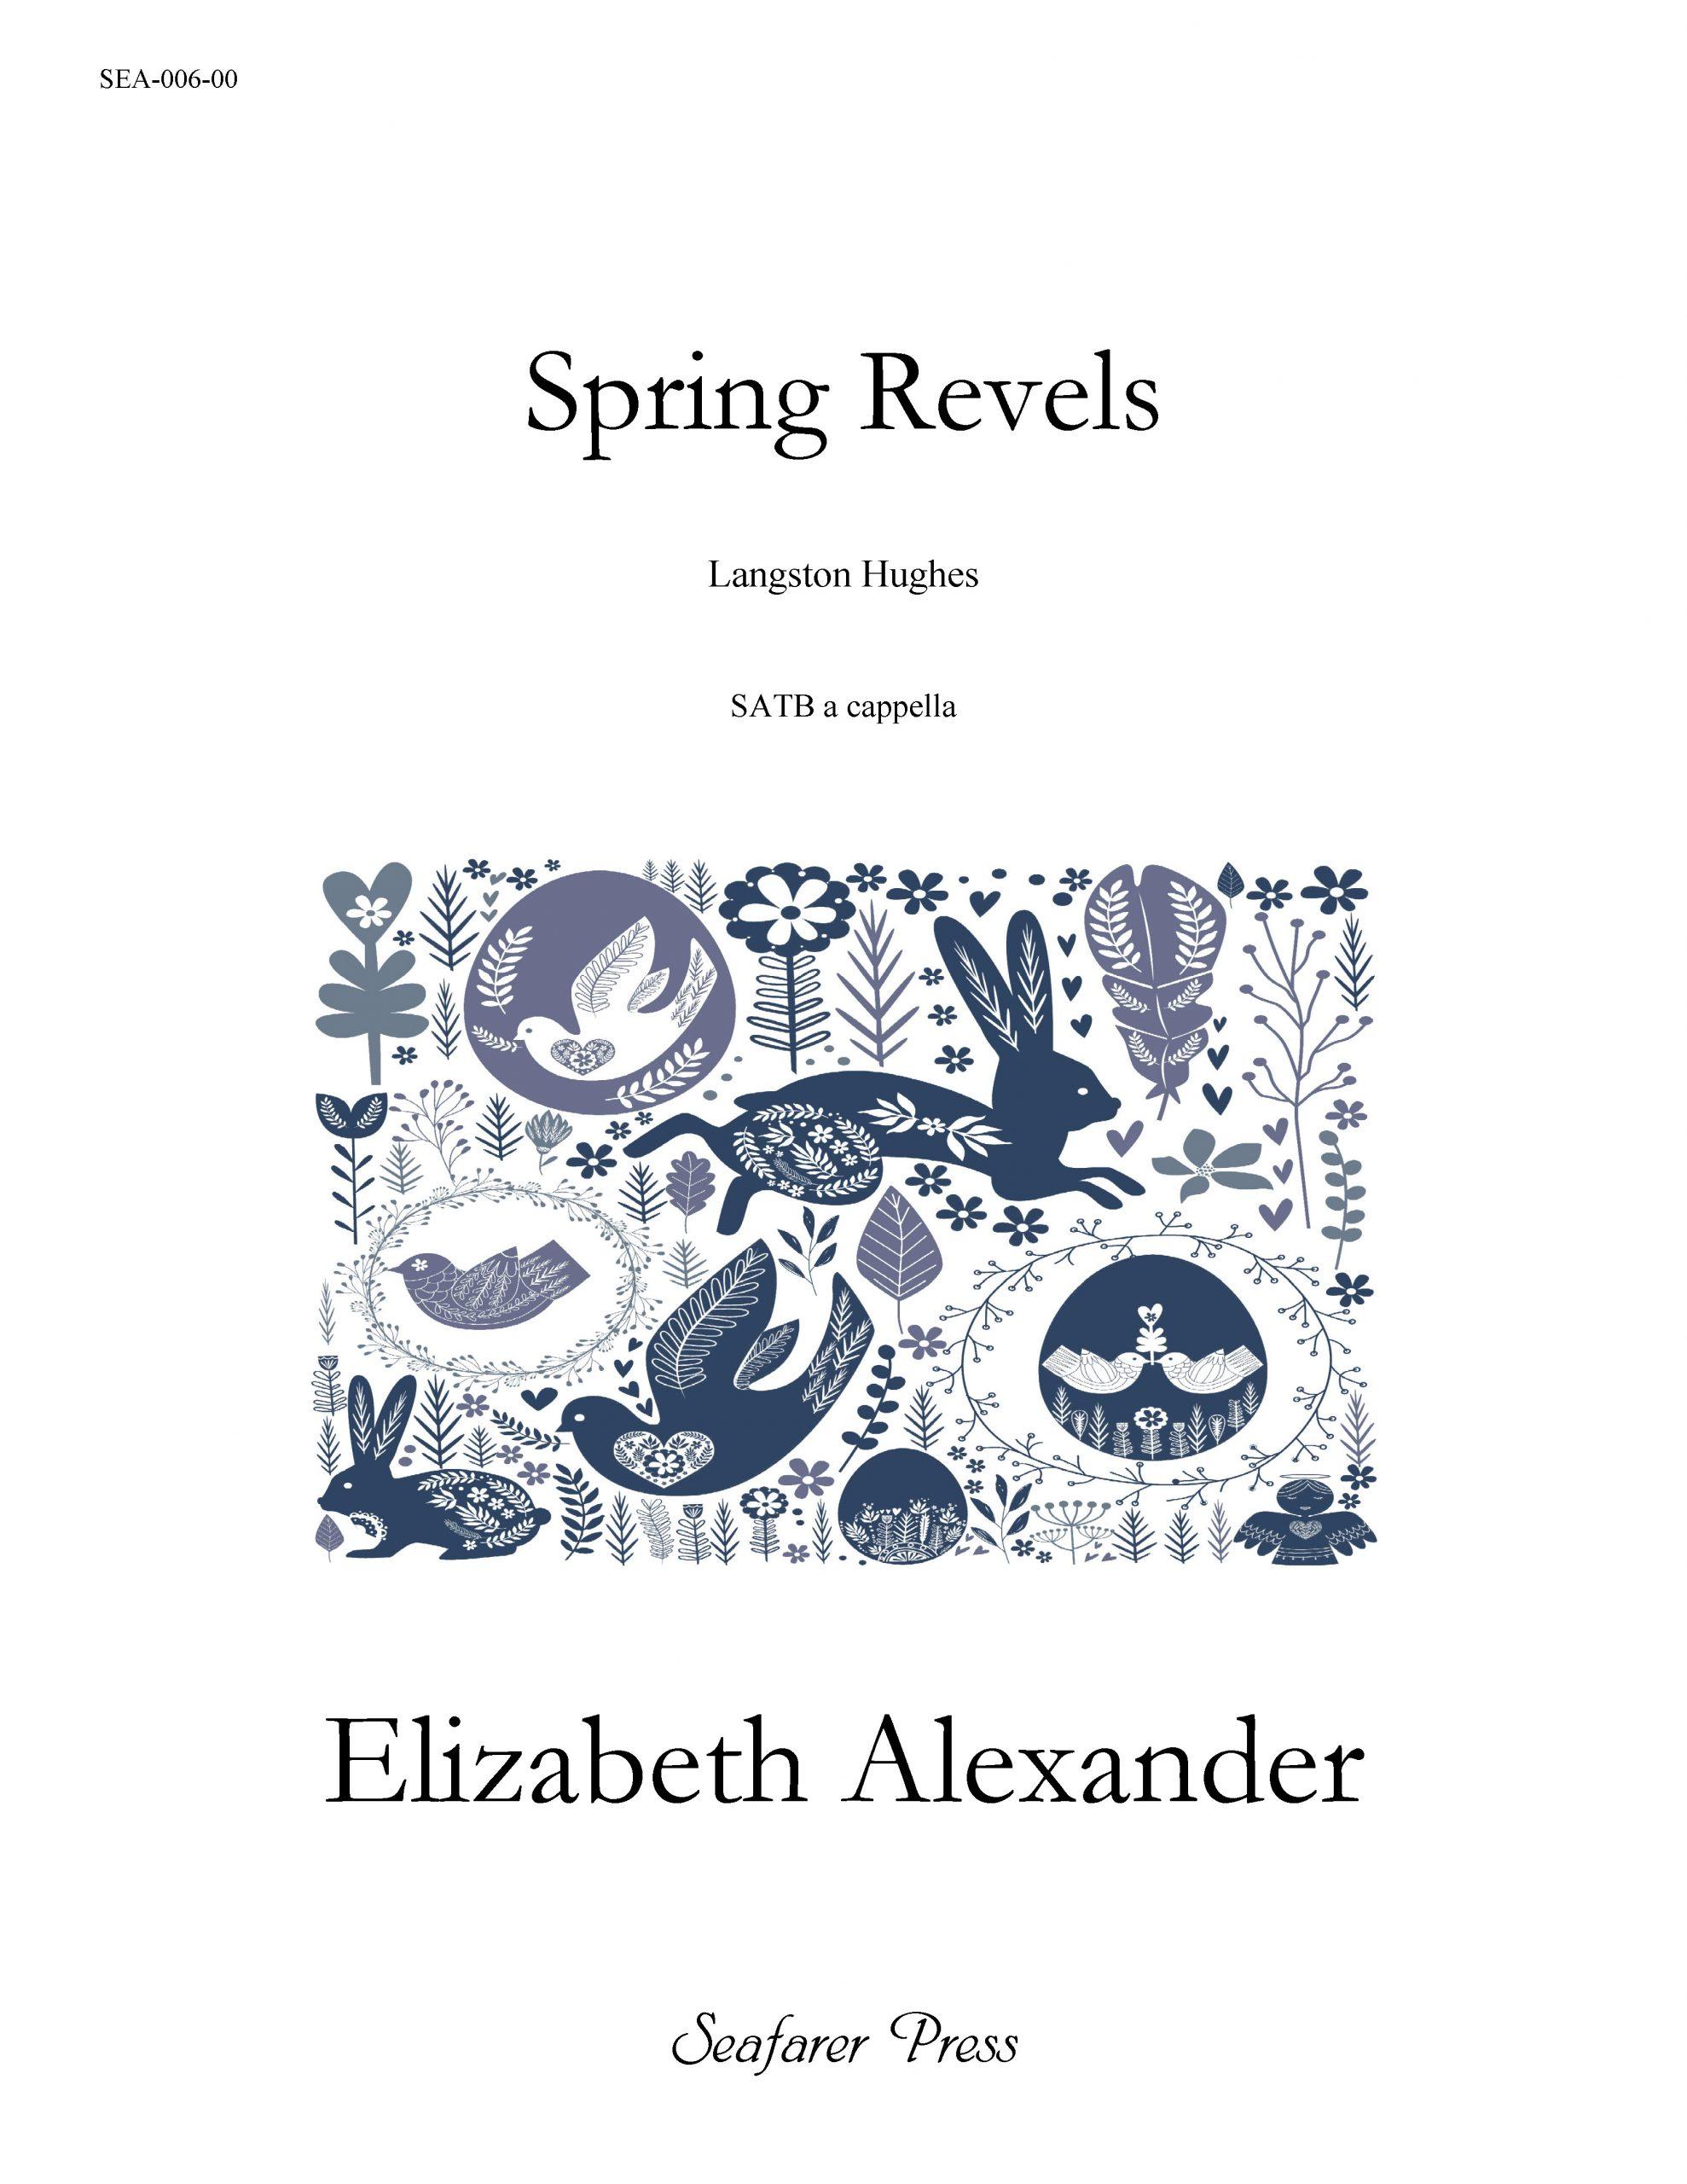 SEA-006-00 - Spring Revels